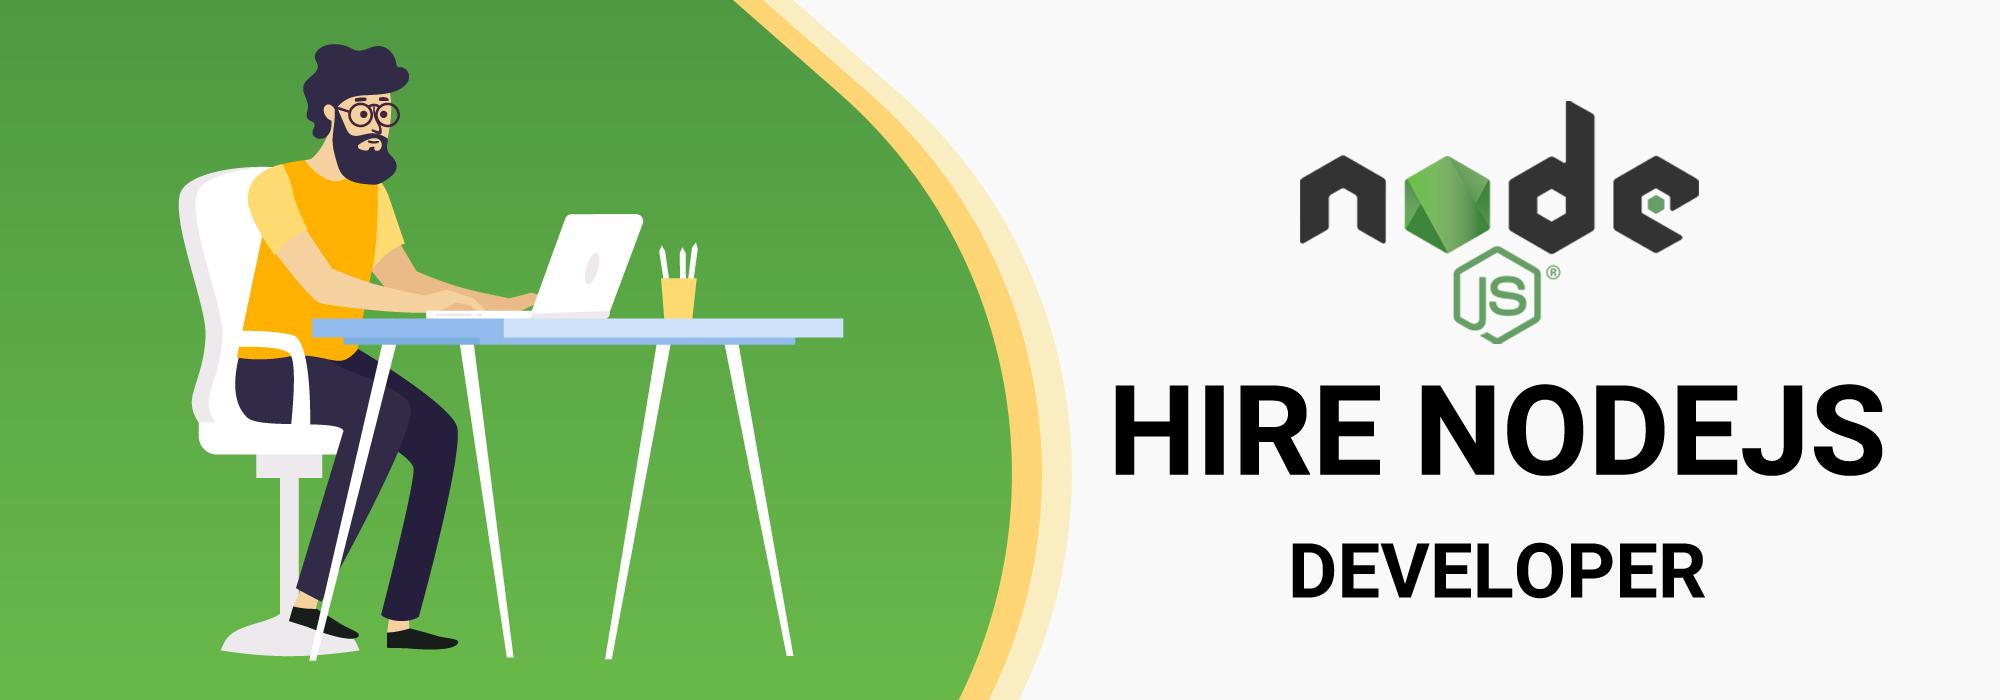 Hire Node JS Developers Node.JS Development Services